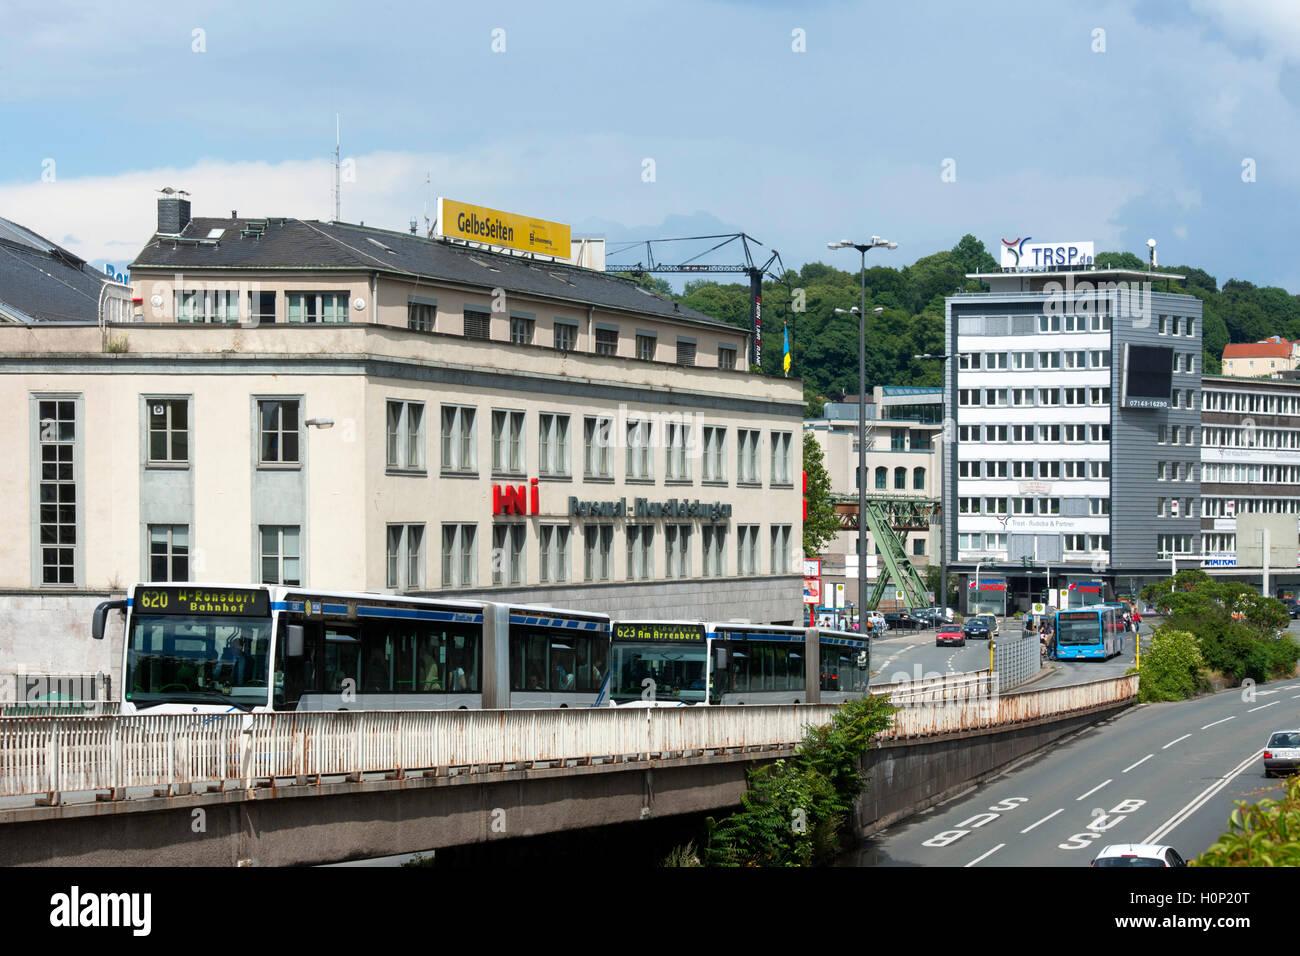 Deutschland, Nordrhein-Westfalen, Wuppertal-Elberfeld, Döppersberg